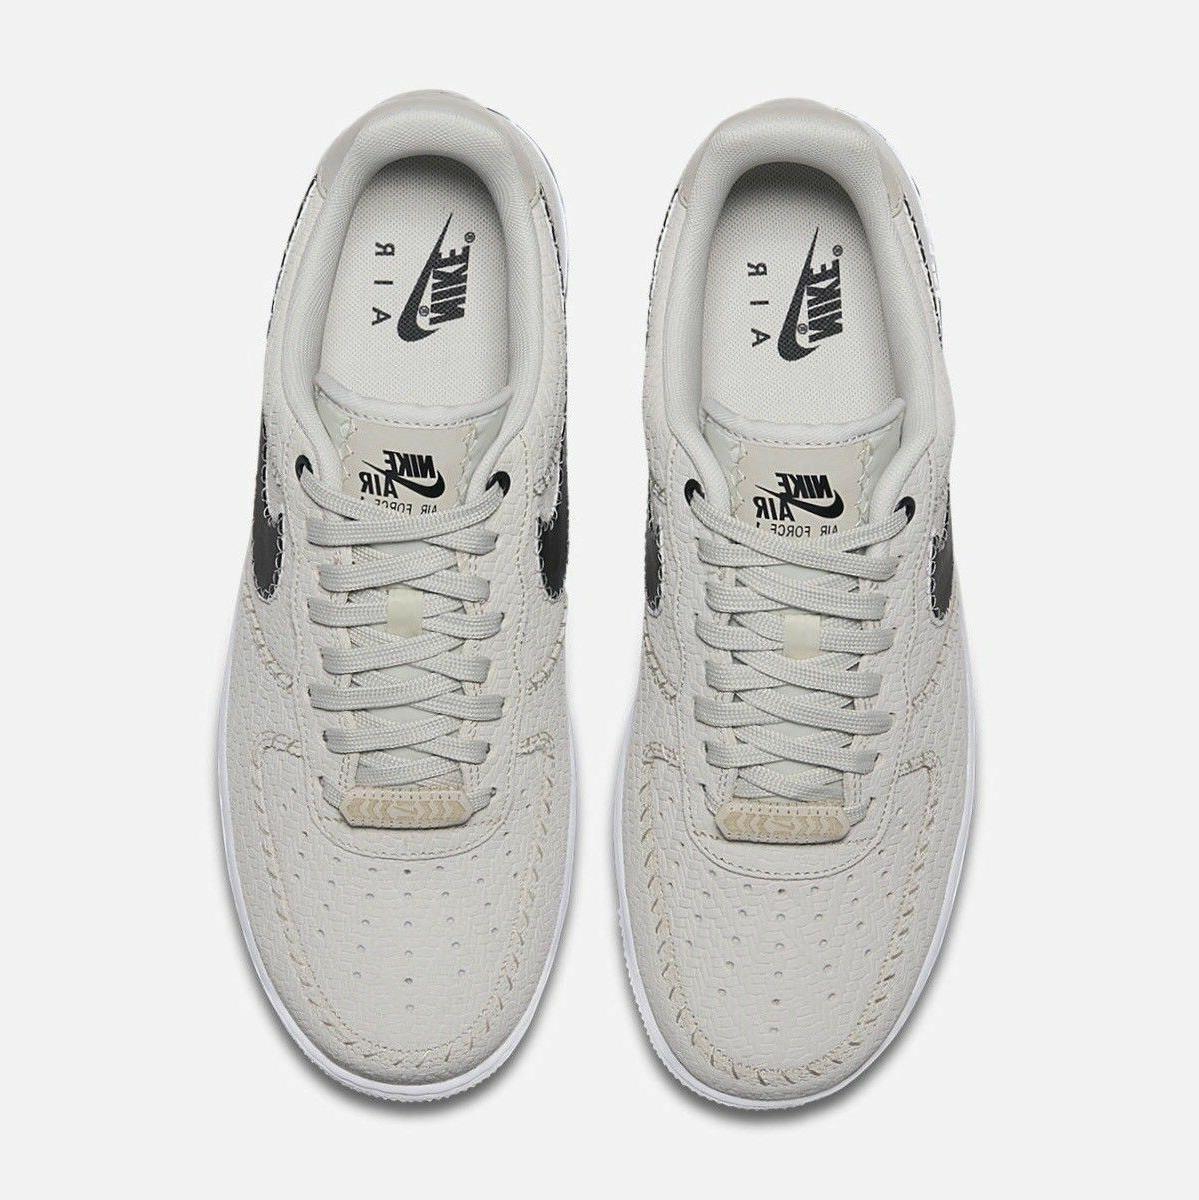 Nike Air '07 Light Black White Size 14 TOP